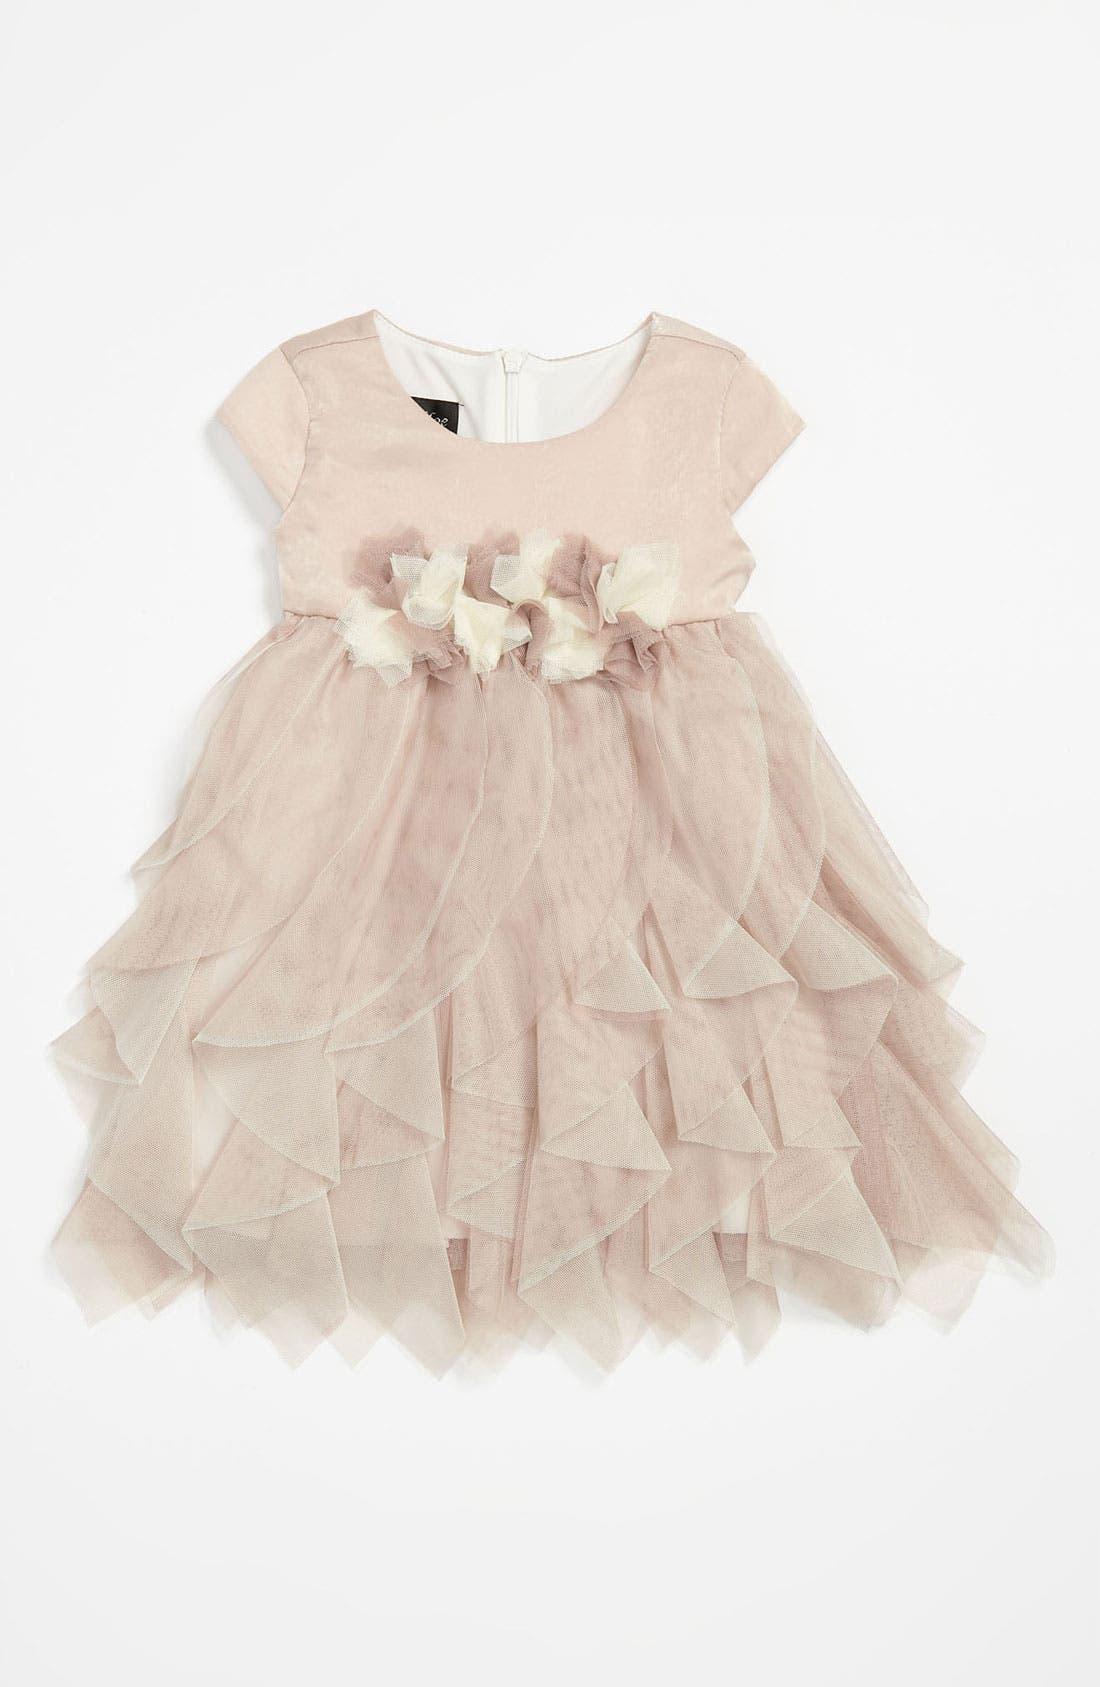 Main Image - Isobella & Chloe 'Pixie' Dress (Toddler)